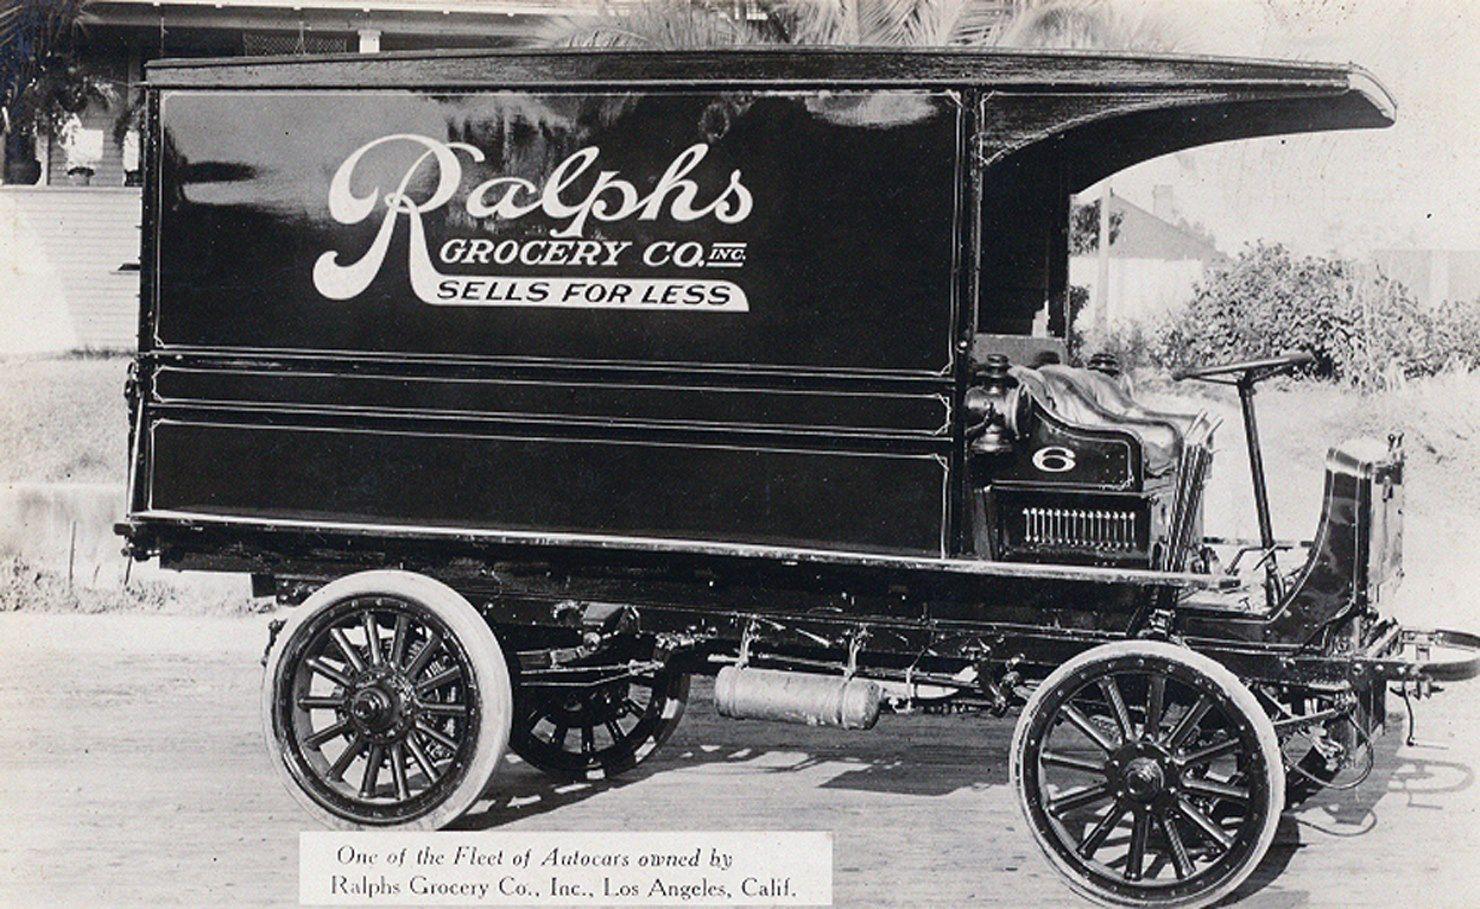 ralphs grocery store truck history pasadena restaurants los angeles california. Black Bedroom Furniture Sets. Home Design Ideas